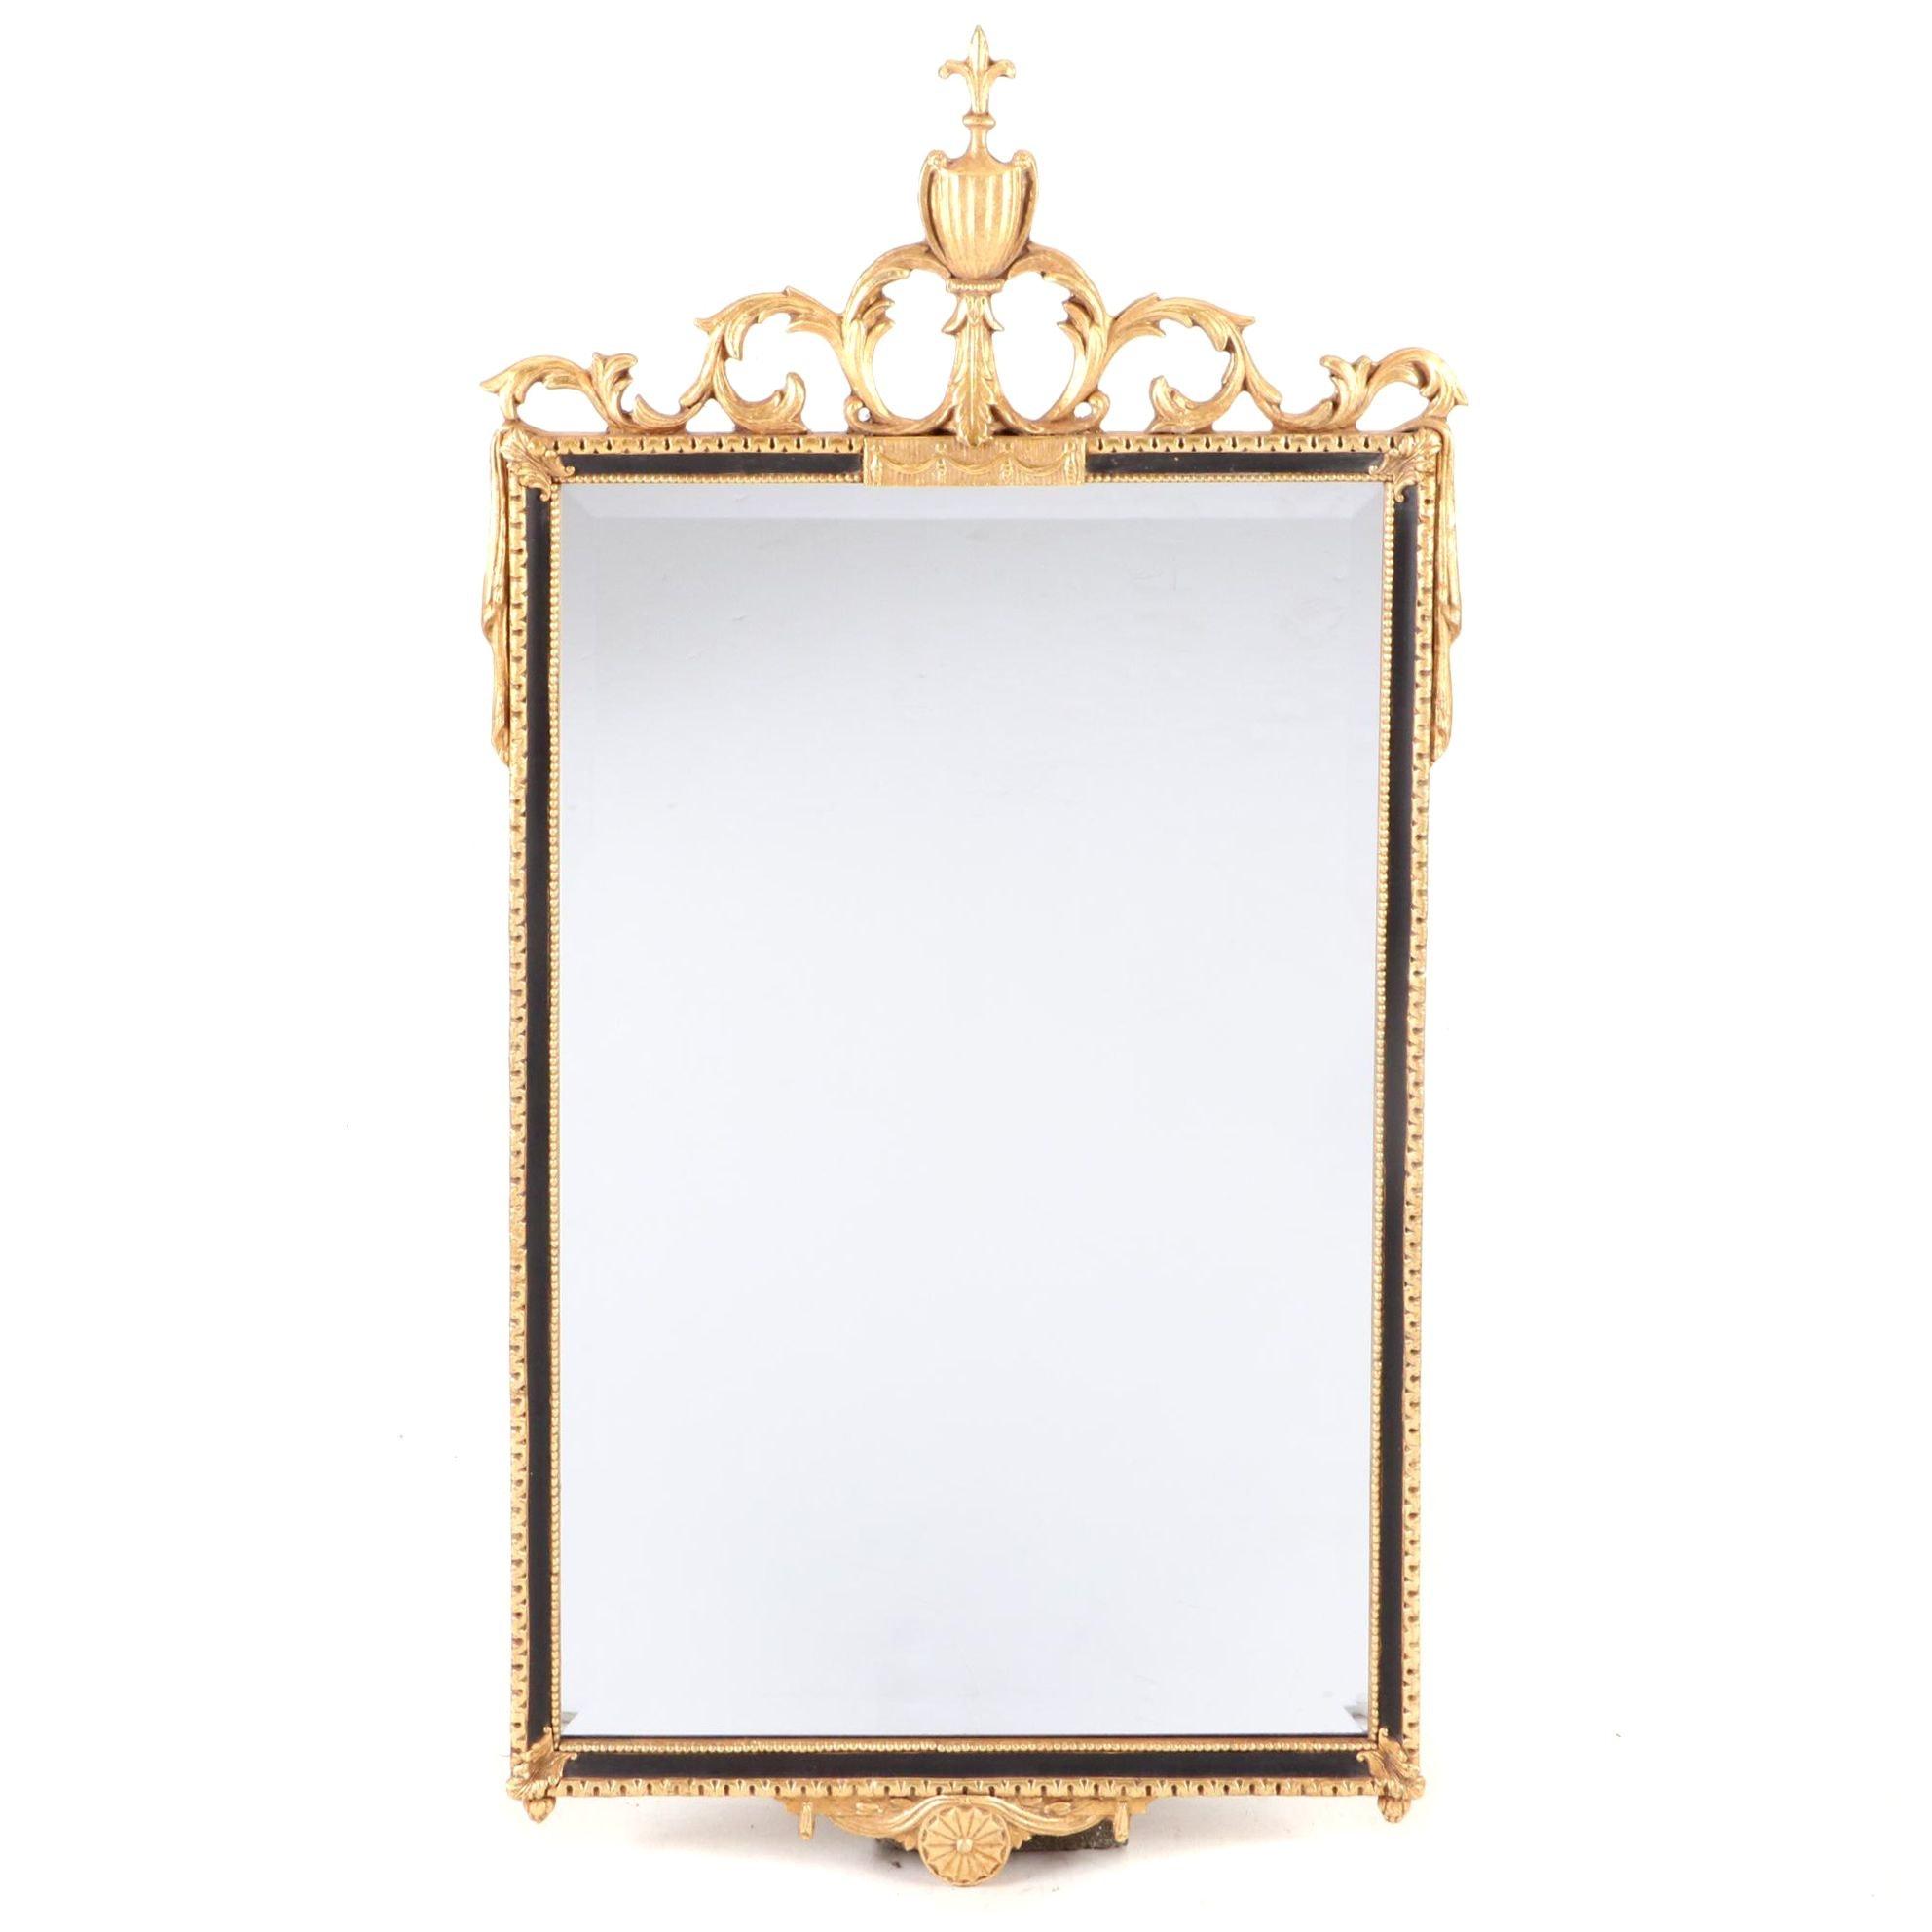 Friedman Brothers Hepplewhite Gilt Mirror